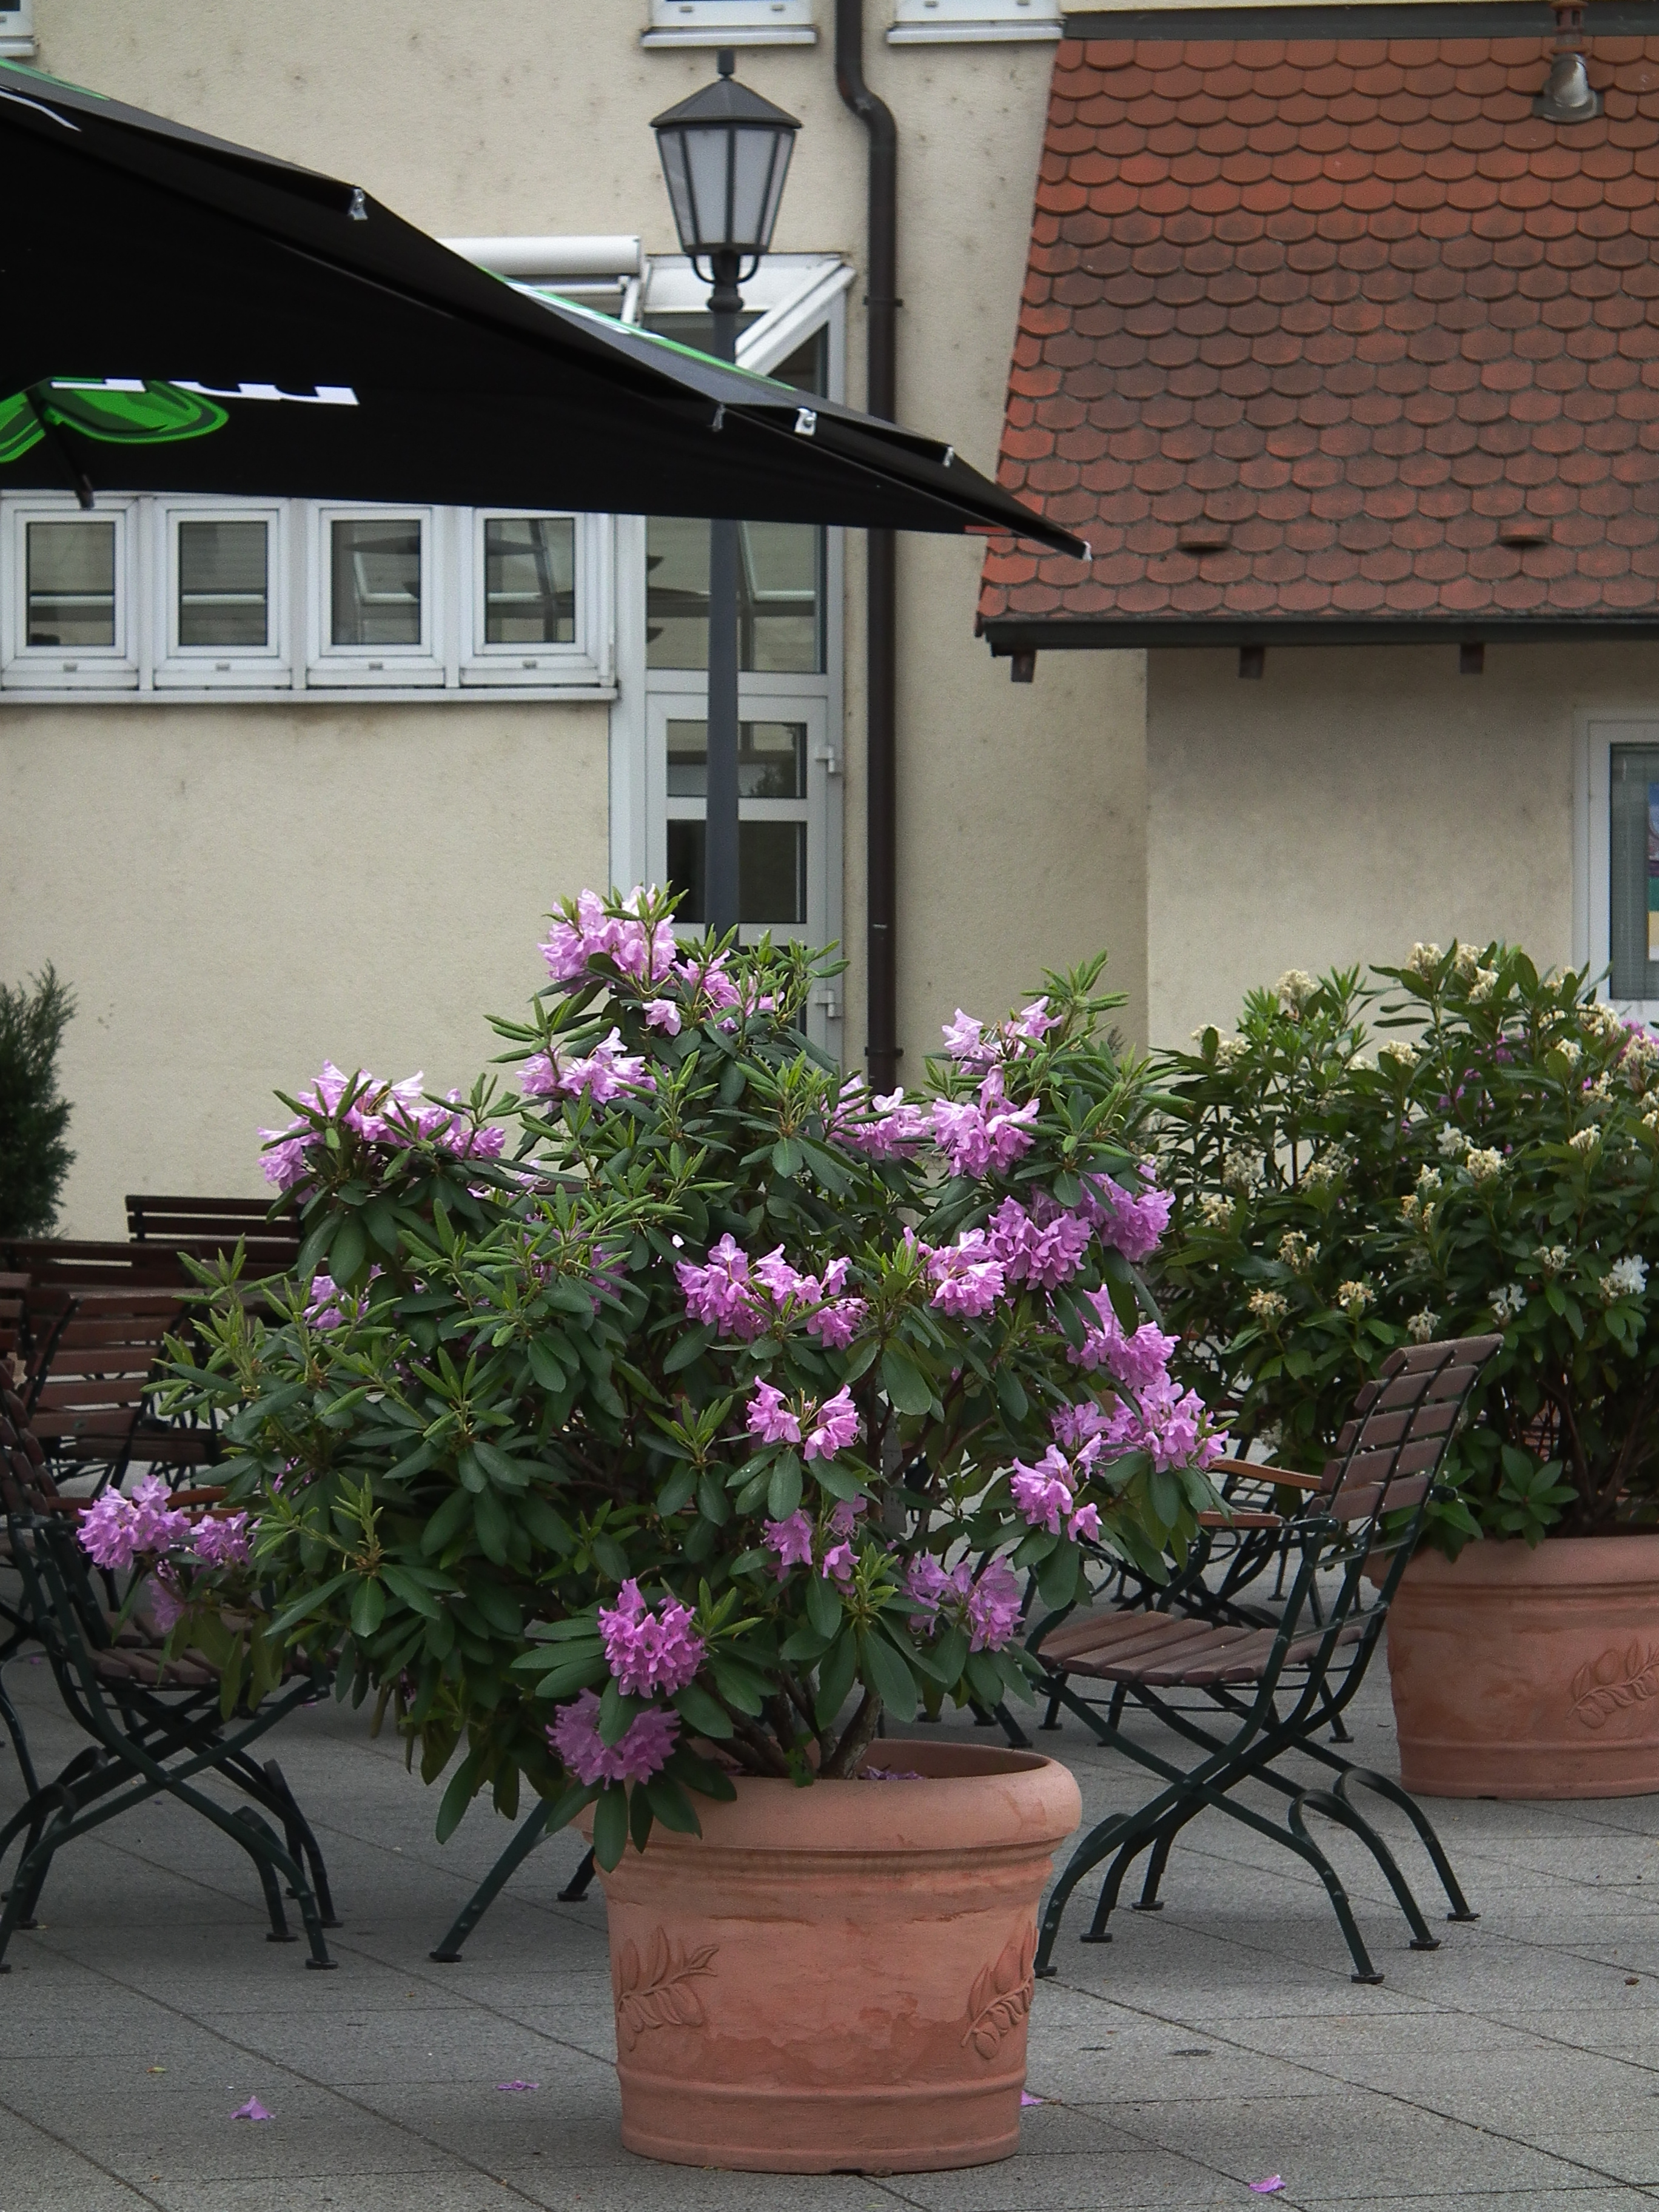 file lila rhododenron im k bel jpg wikimedia commons. Black Bedroom Furniture Sets. Home Design Ideas